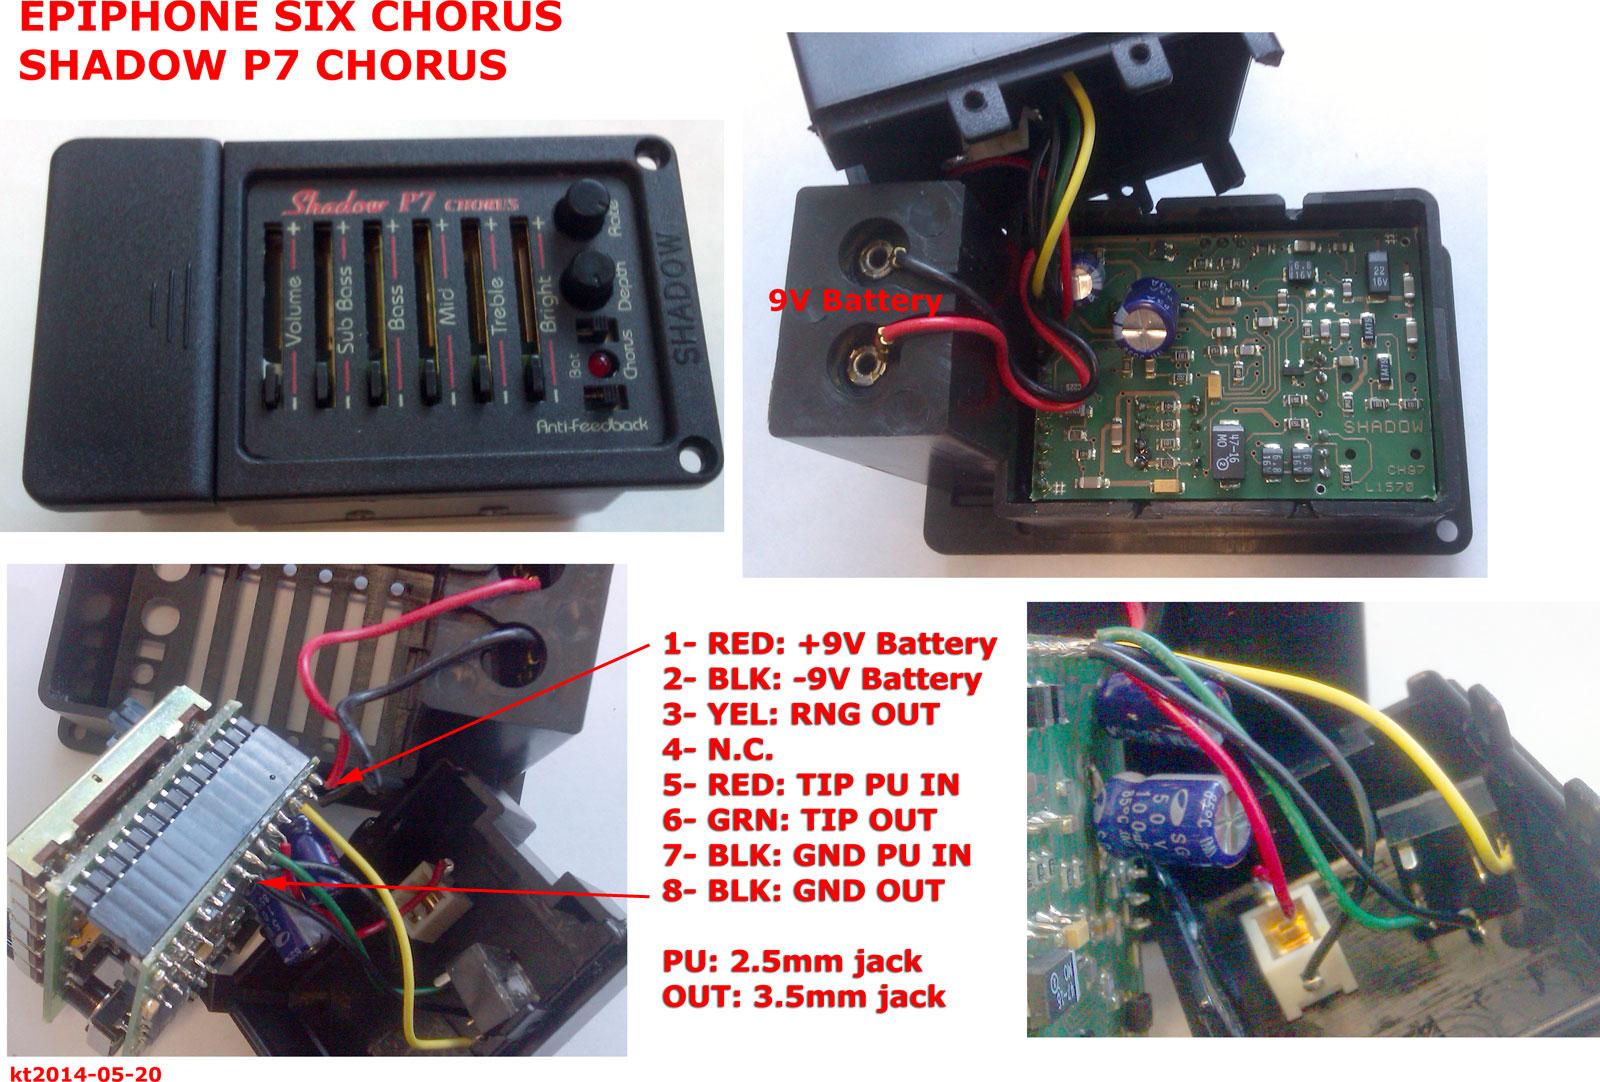 Directory Listing Of Faq How 2 5mm Jack Wiring Eq5 Internal Connection 159kb Mar 12 2015 043614 Pm